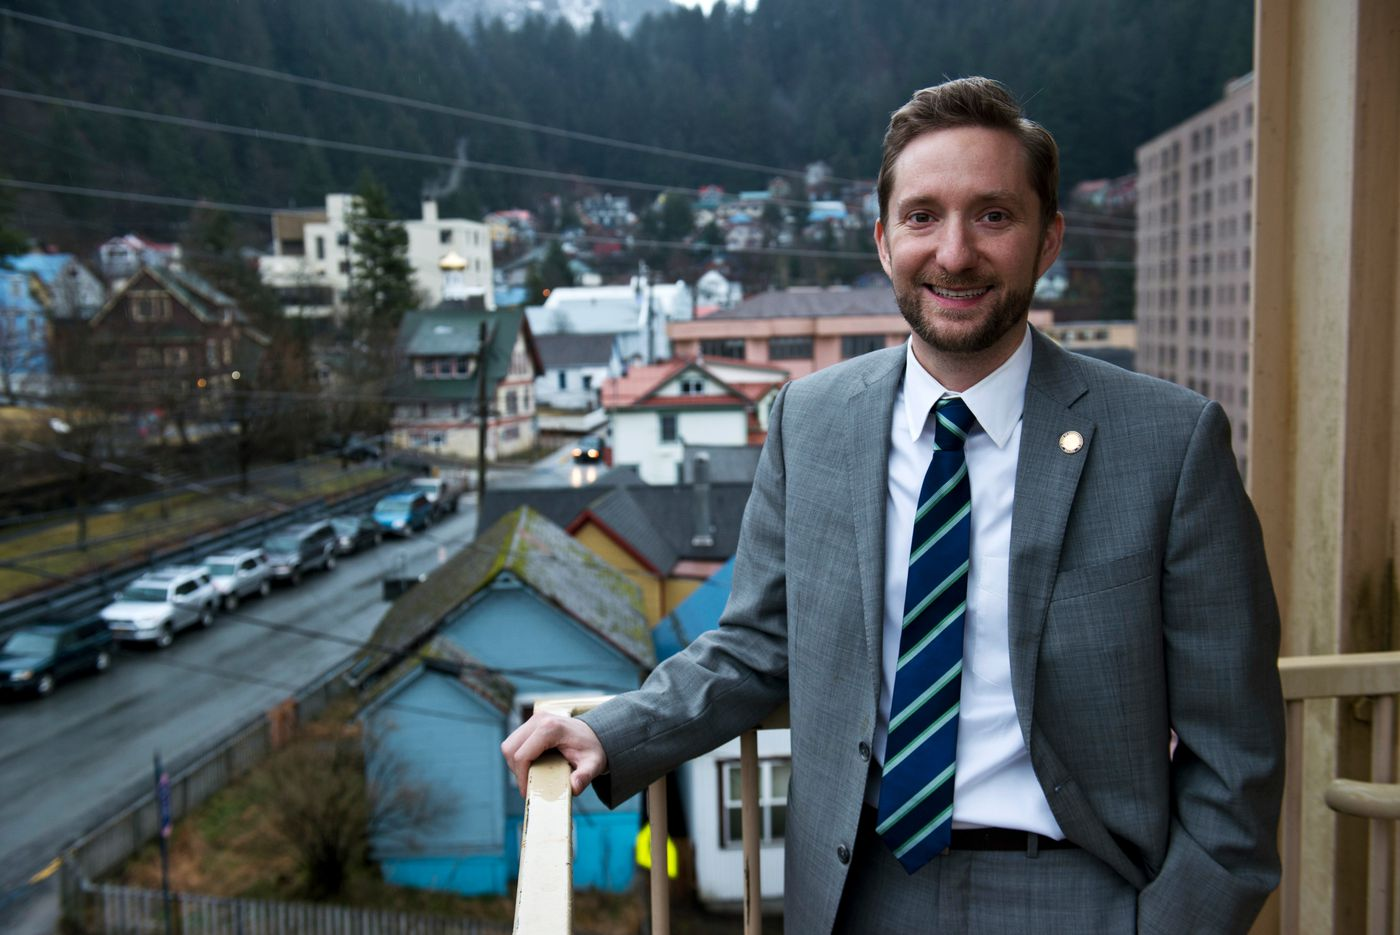 Rep. Jason Grenn, I-Anchorage. (Marc Lester / Alaska Dispatch News)